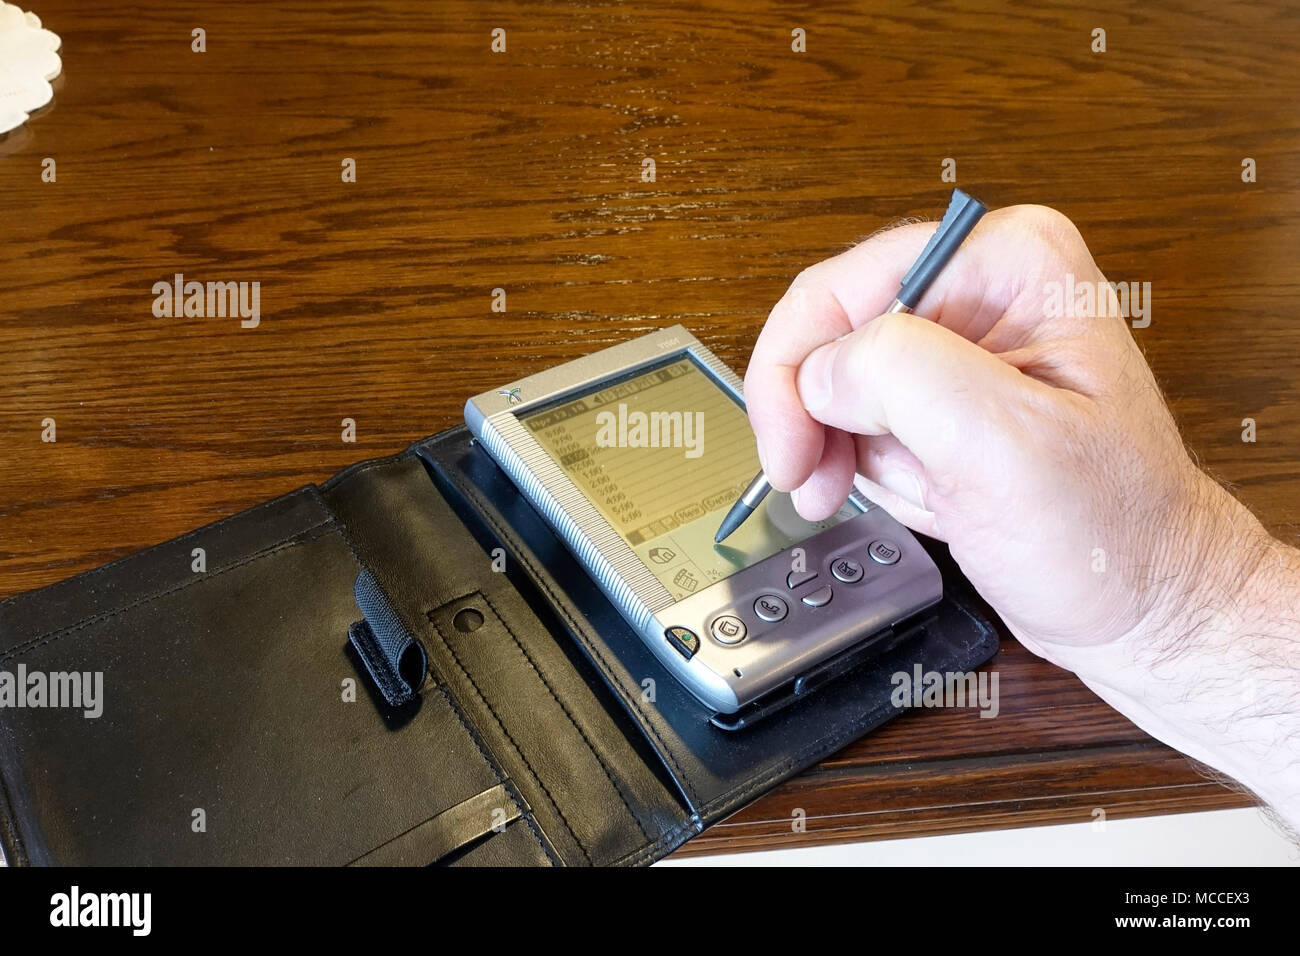 Using a PDA (Handspring Visor) - Stock Image